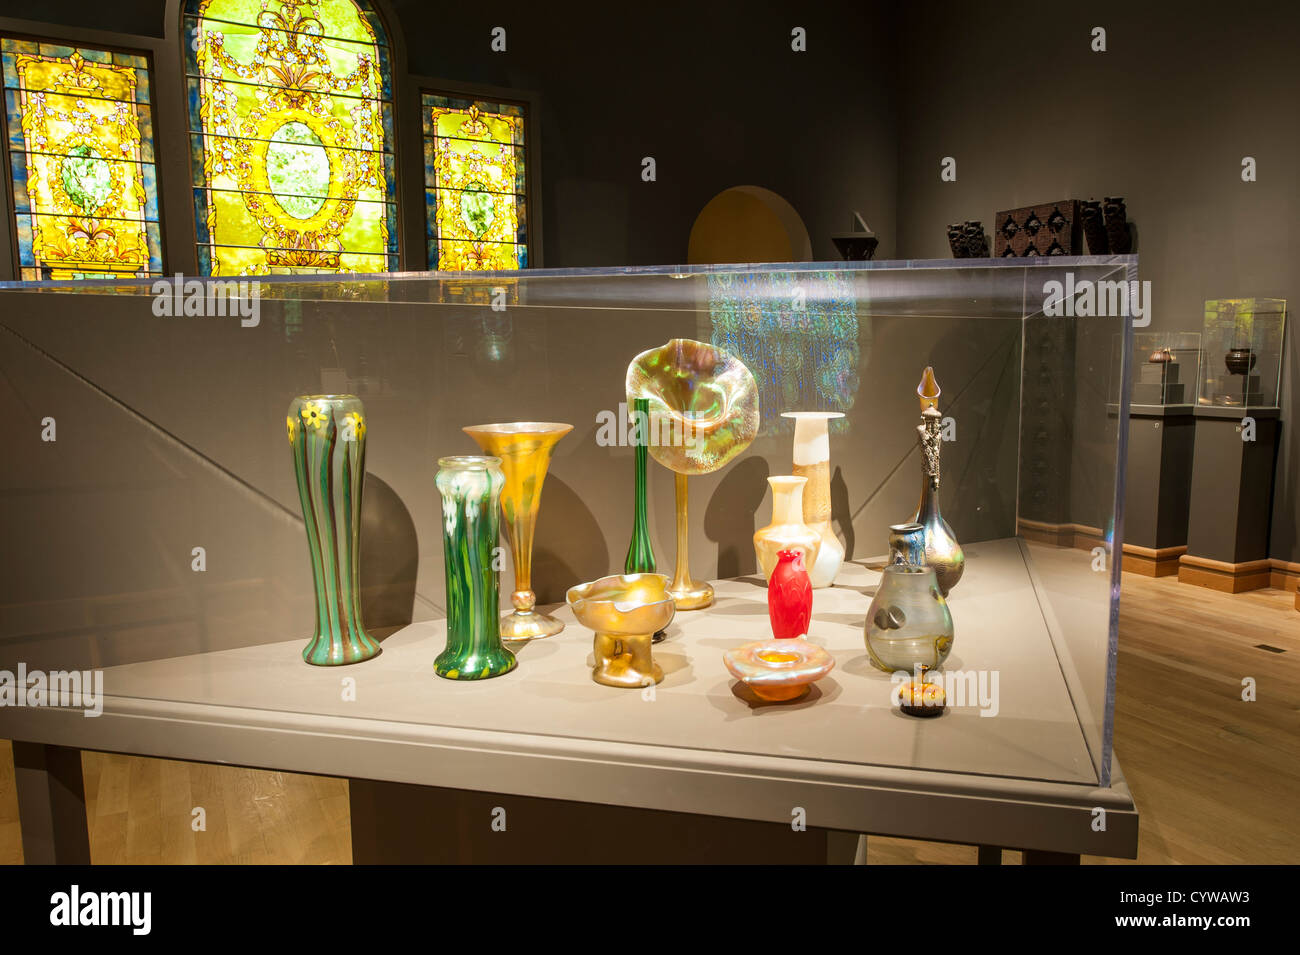 The Charles Hosmer Morse Museum of American Art, Winter Park, Florida. Stock Photo